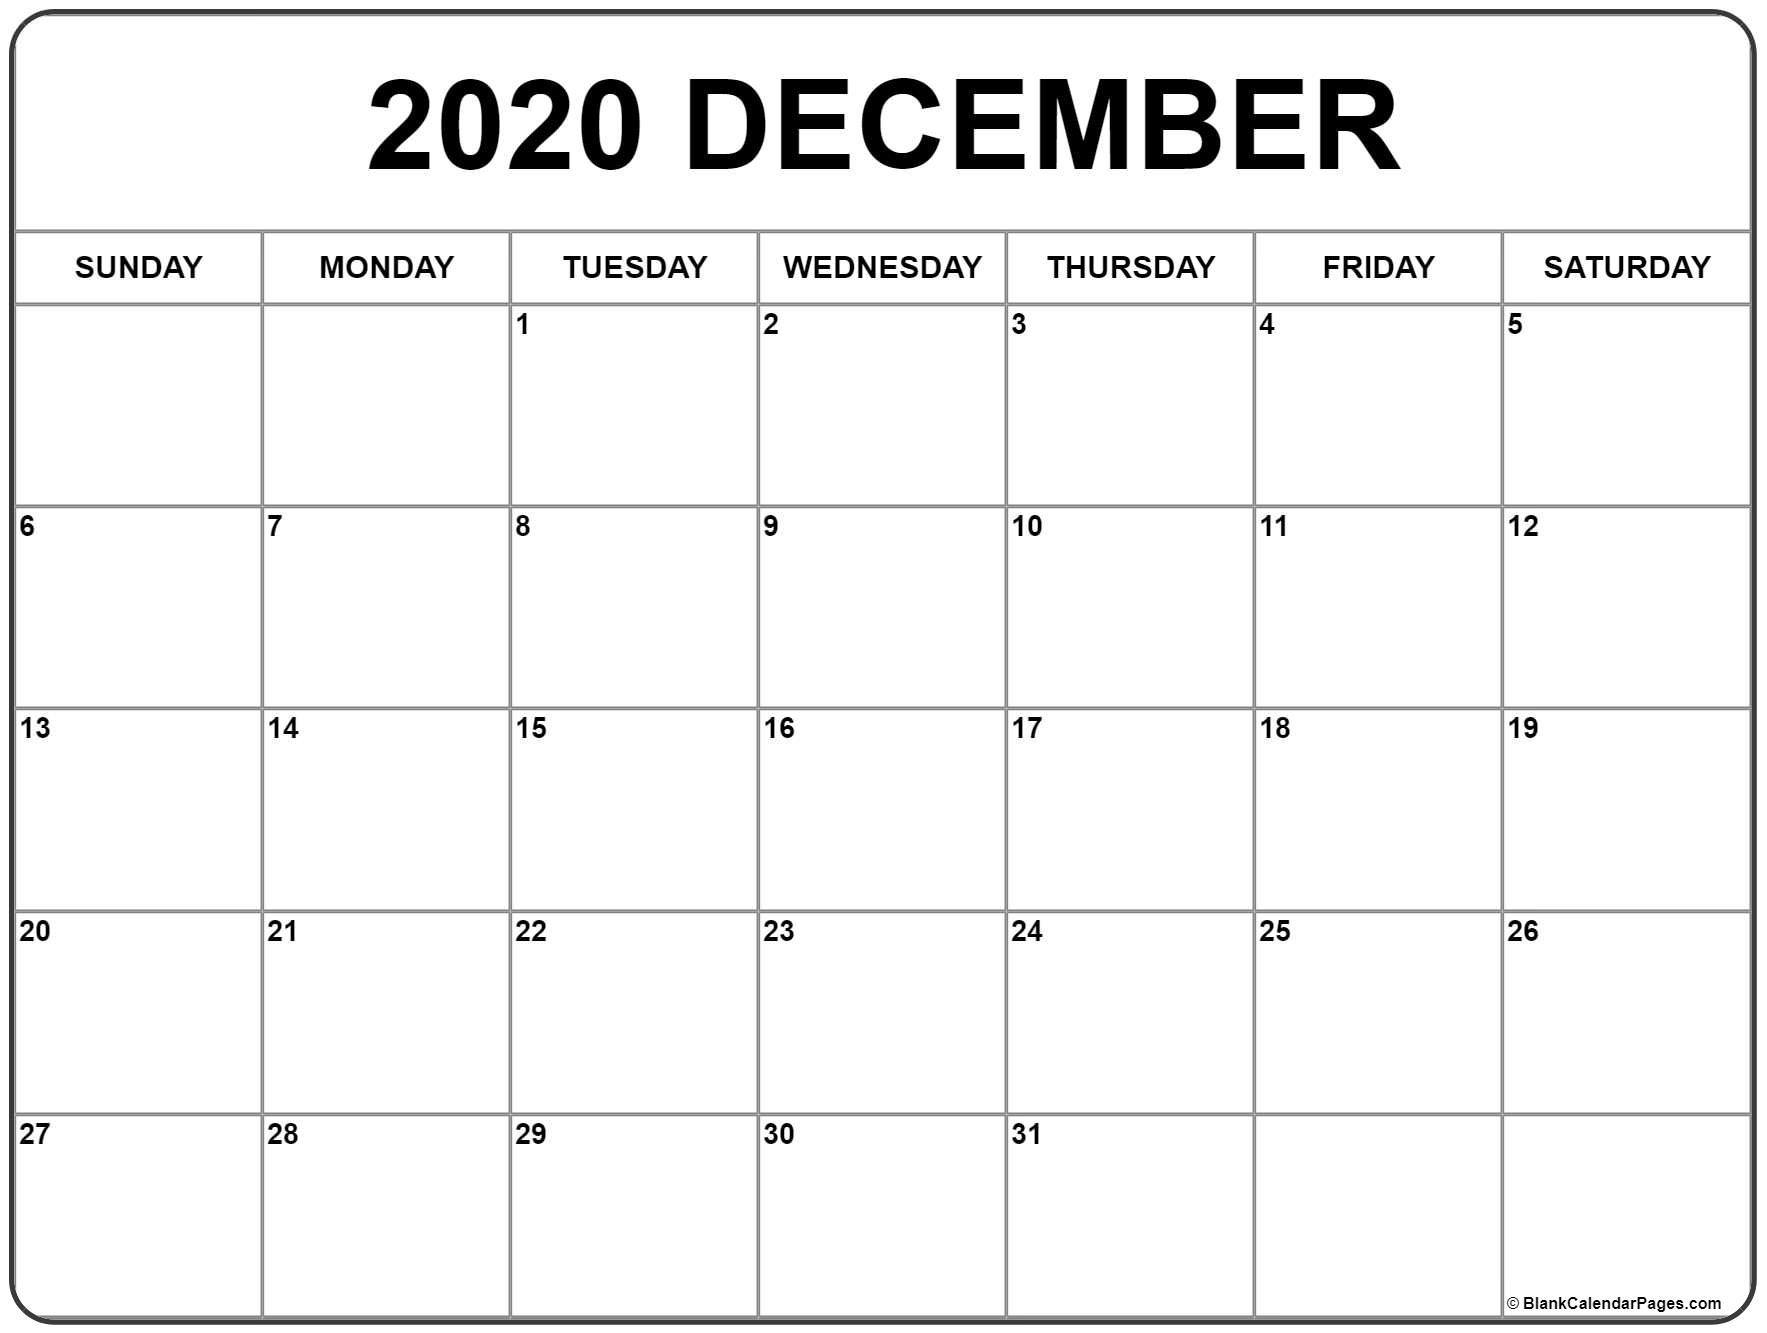 Calendar Template Dec 2020 - Wpa.wpart.co